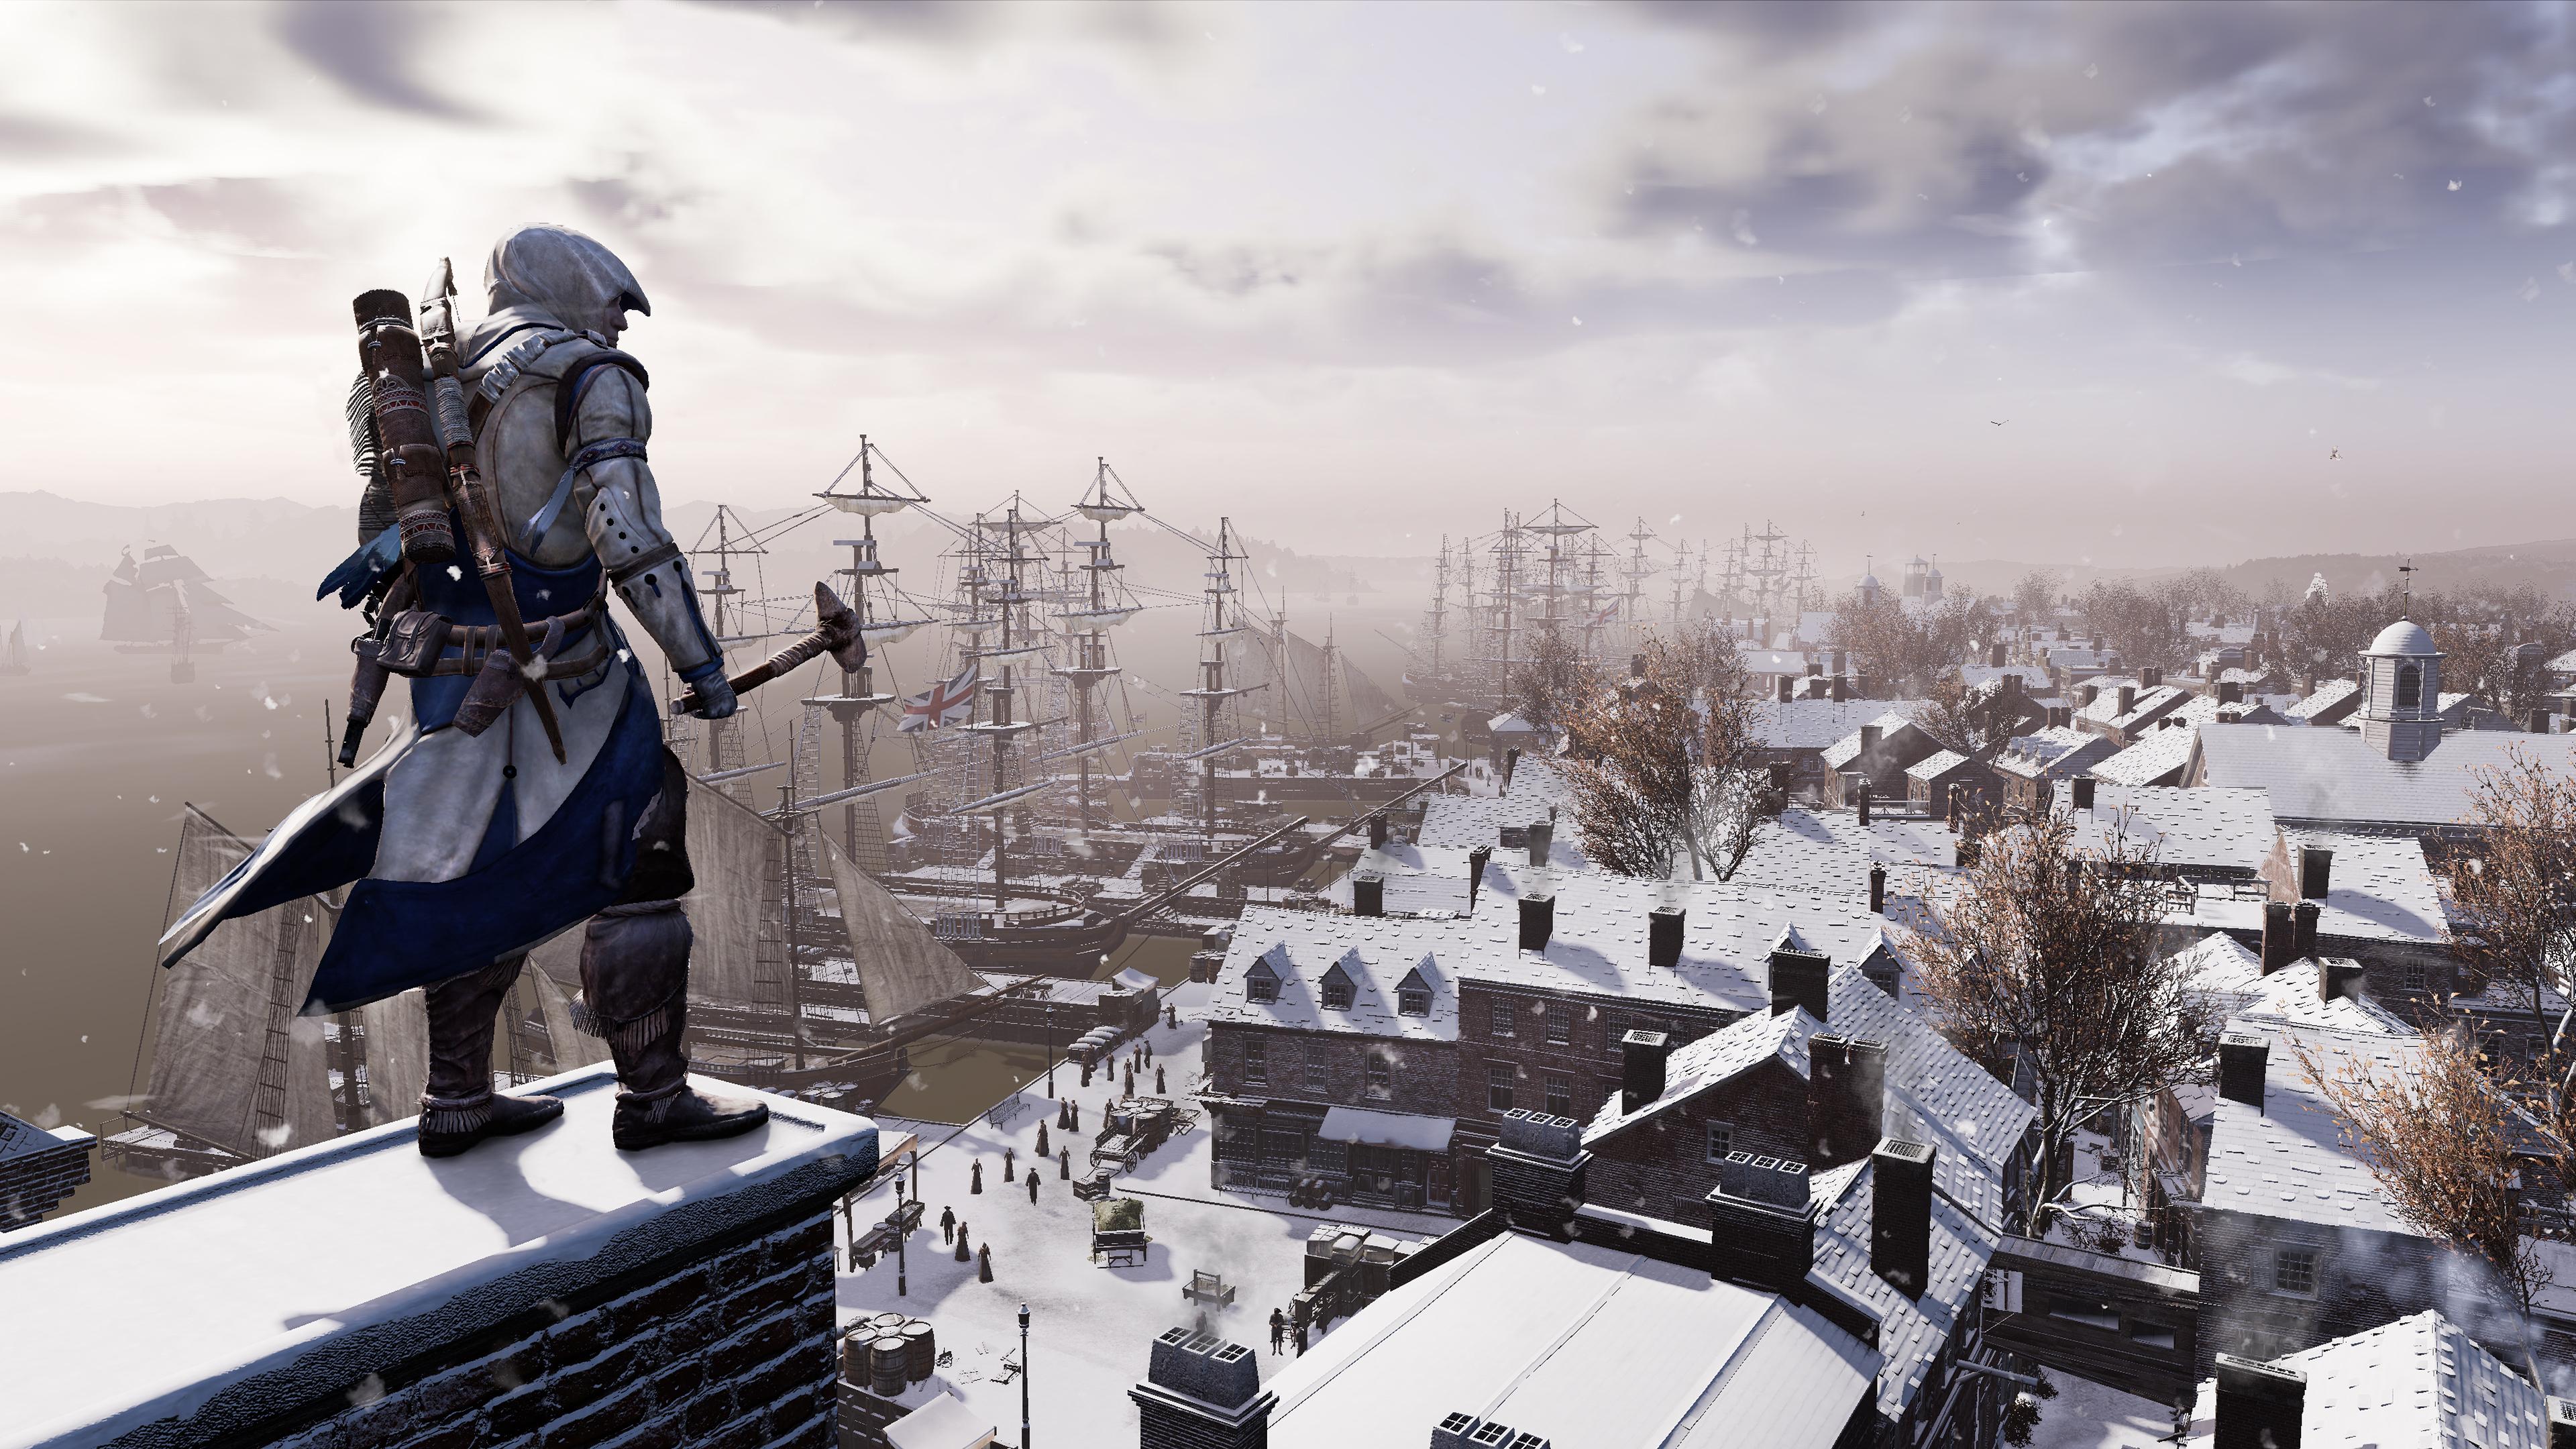 Ремастер - Assassin's Creed 3 4K